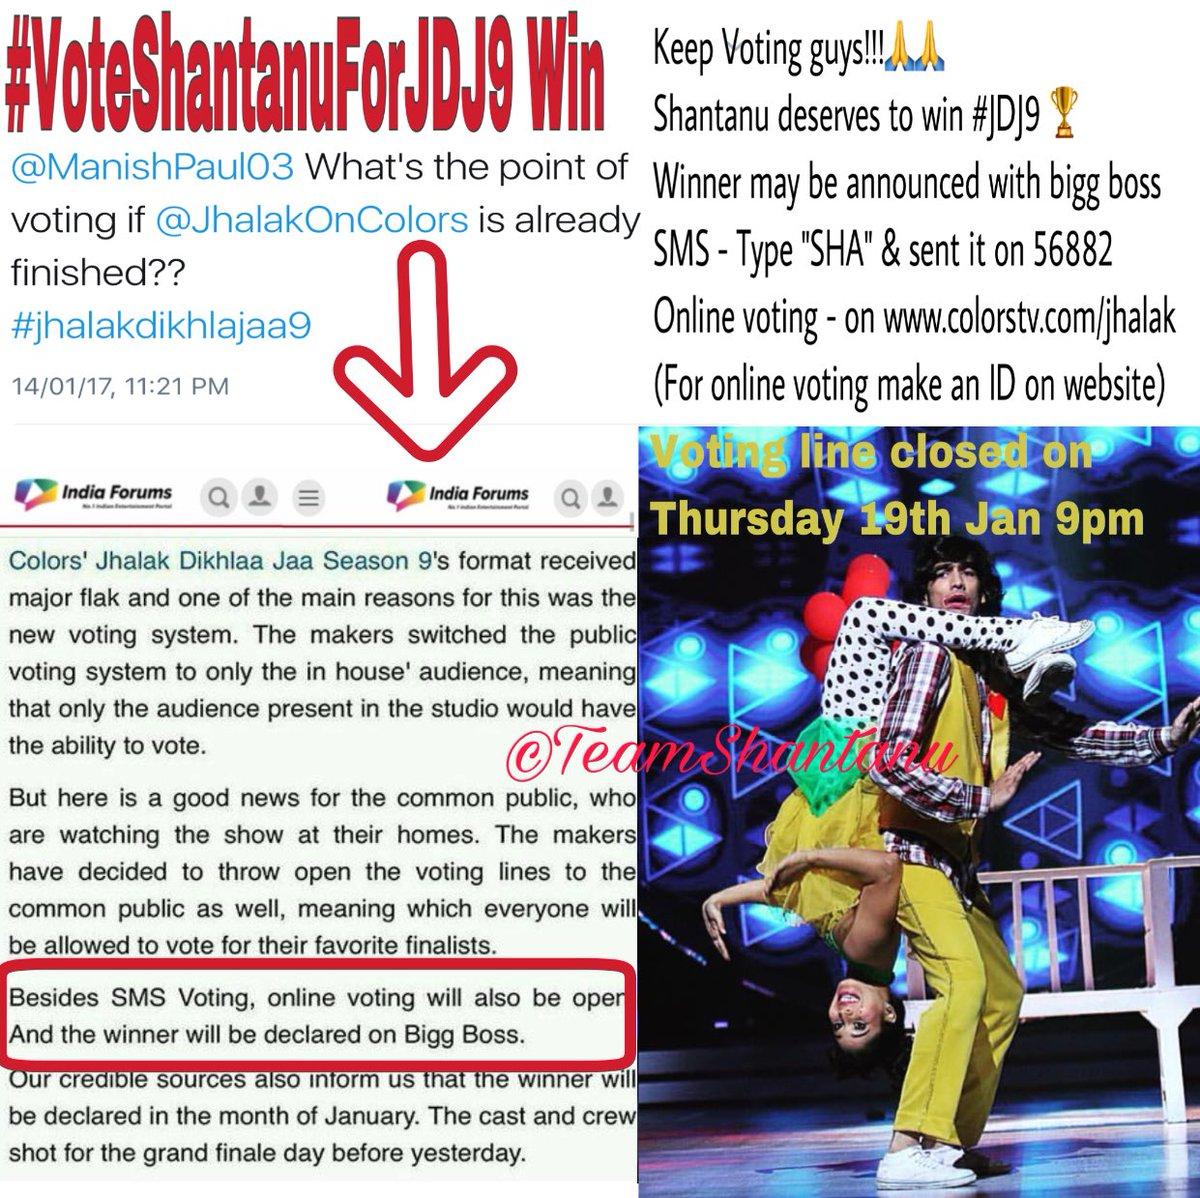 Colors website bigg boss 9 voting - Keep Voting 4 Shantanu As Jdj9finale Has Already Shot But Winner Will Be Announced Wid Bb10 By Indiaforums Jdj9pic Twitter Com Dsd4bp17ew